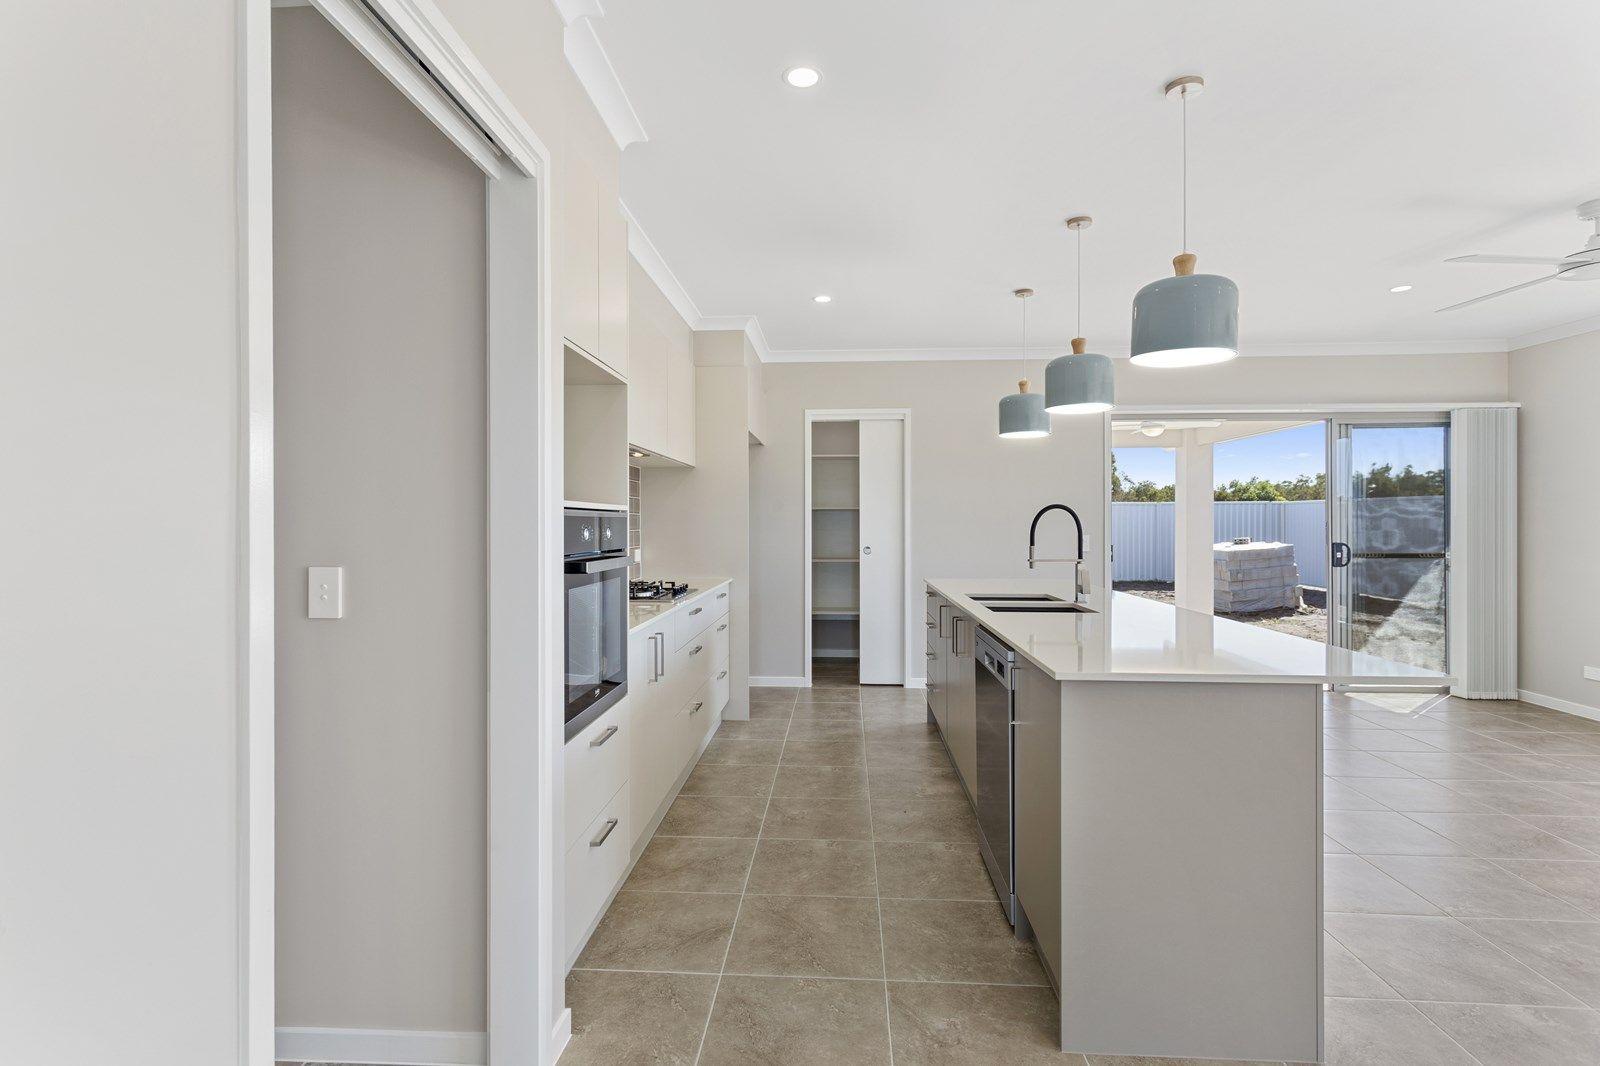 Lot 5 Cedarwood Place, Landsborough QLD 4550, Image 2